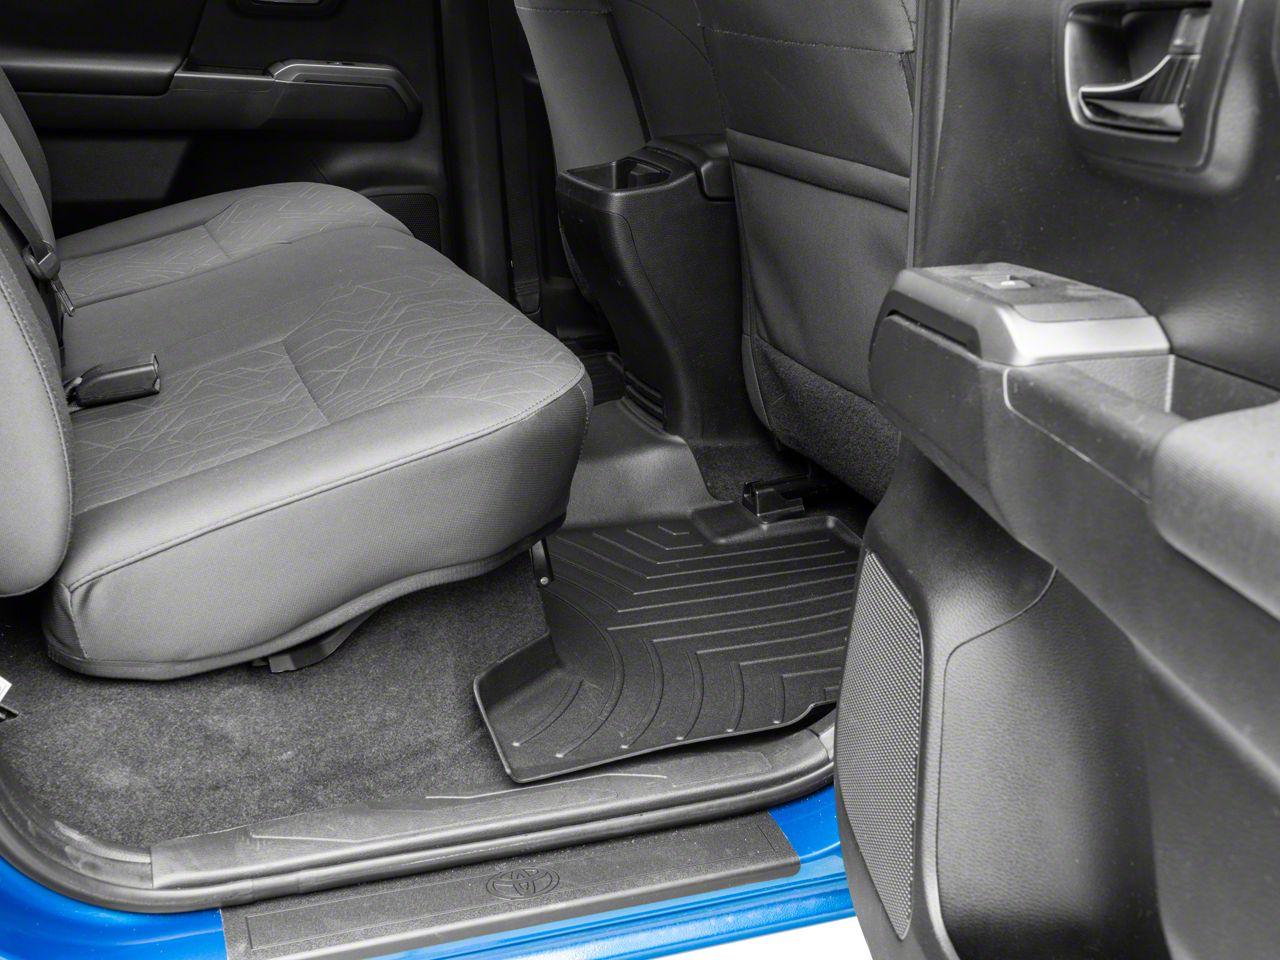 Weathertech DigitalFit Rear Floor Liner - Black (16-19 Tacoma Double Cab)